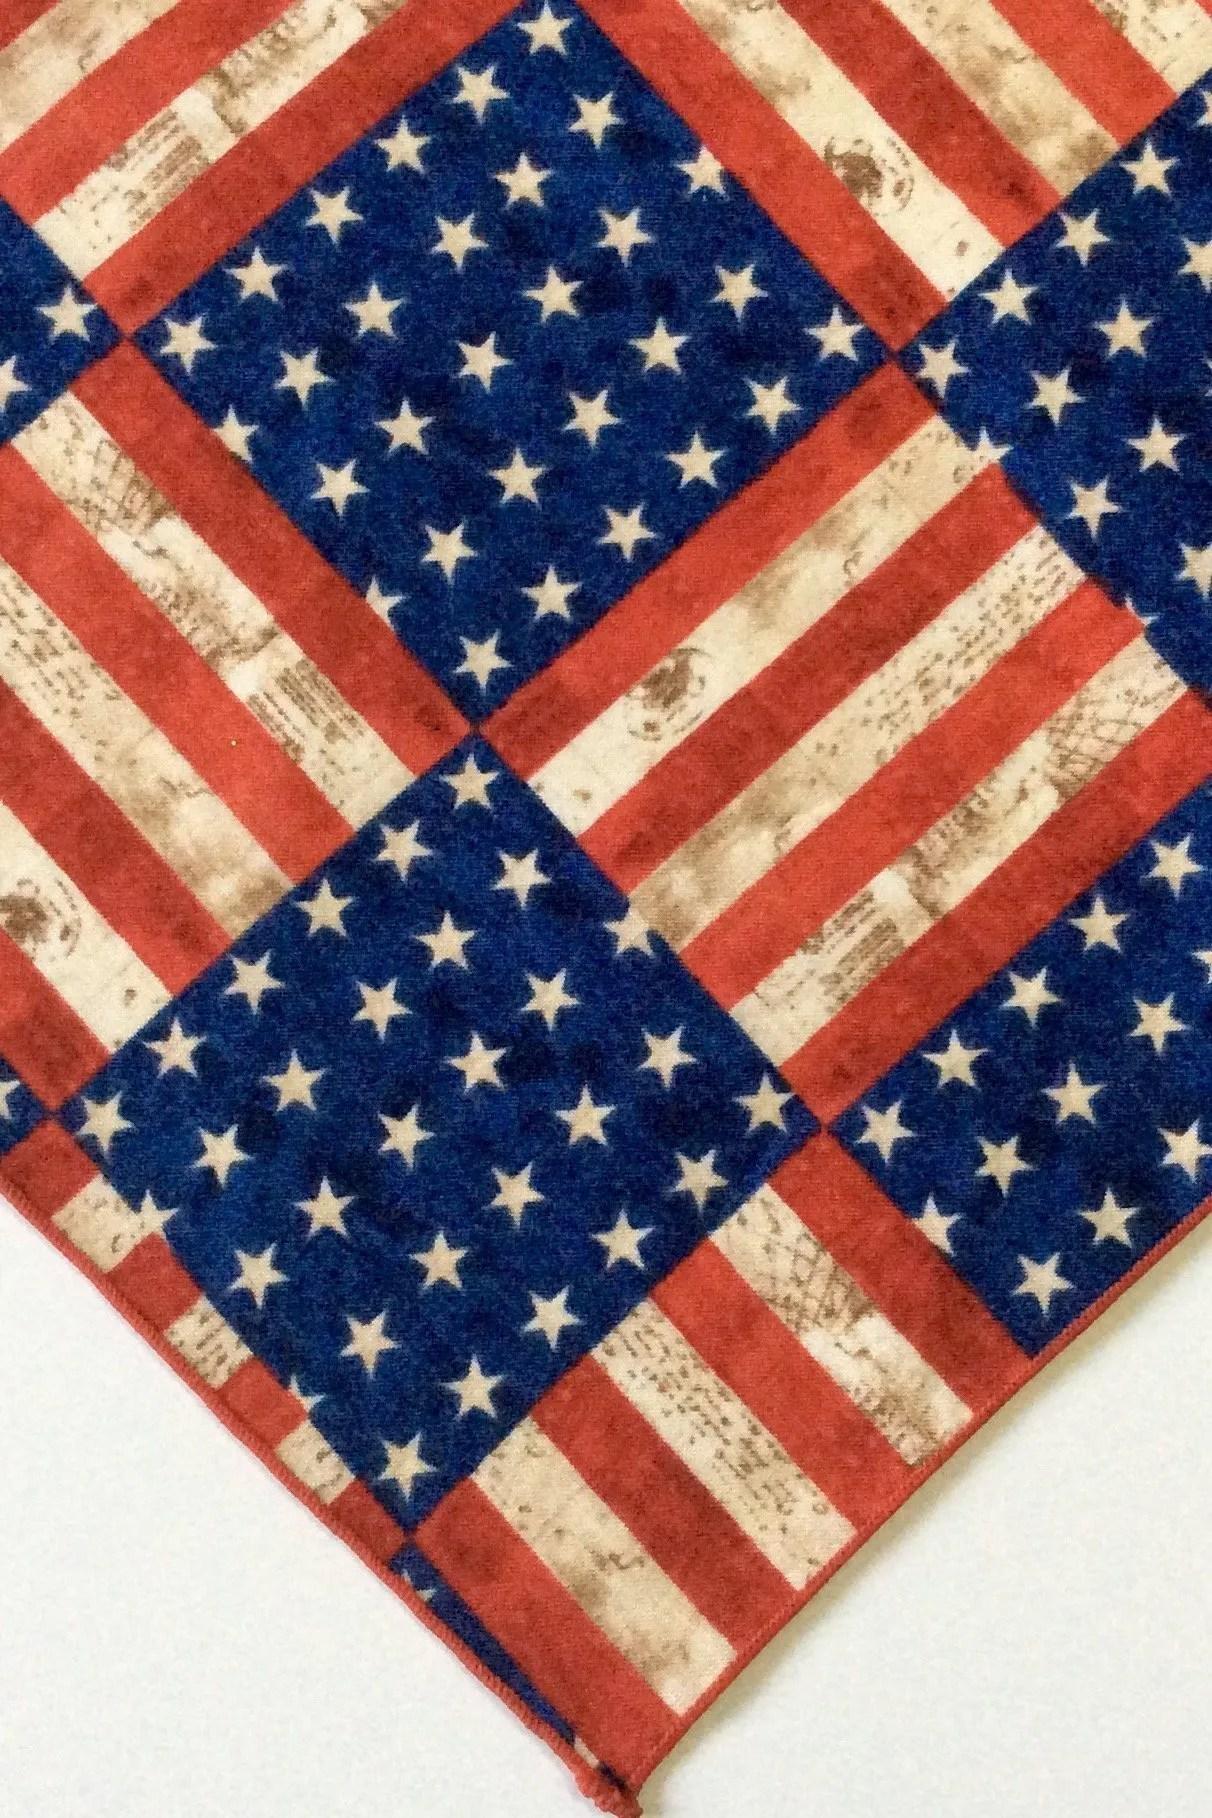 Antiqued American Flag The Bandana Bandits